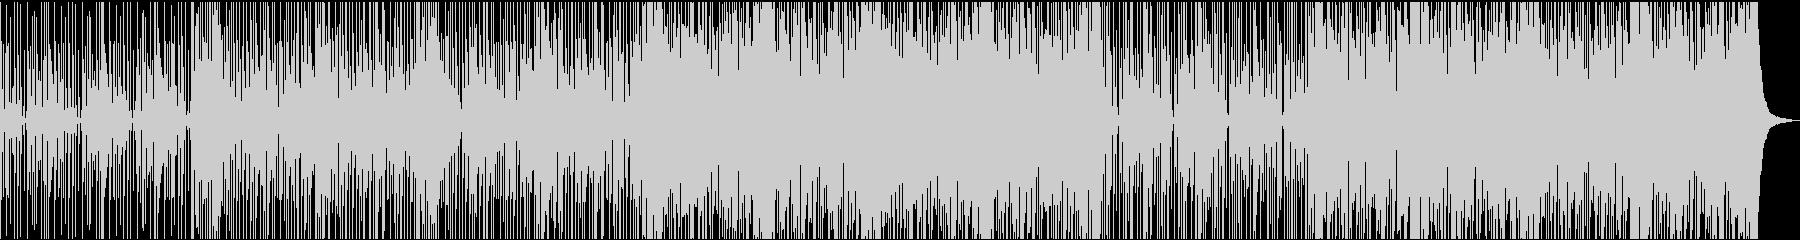 Groovy Funkyの未再生の波形